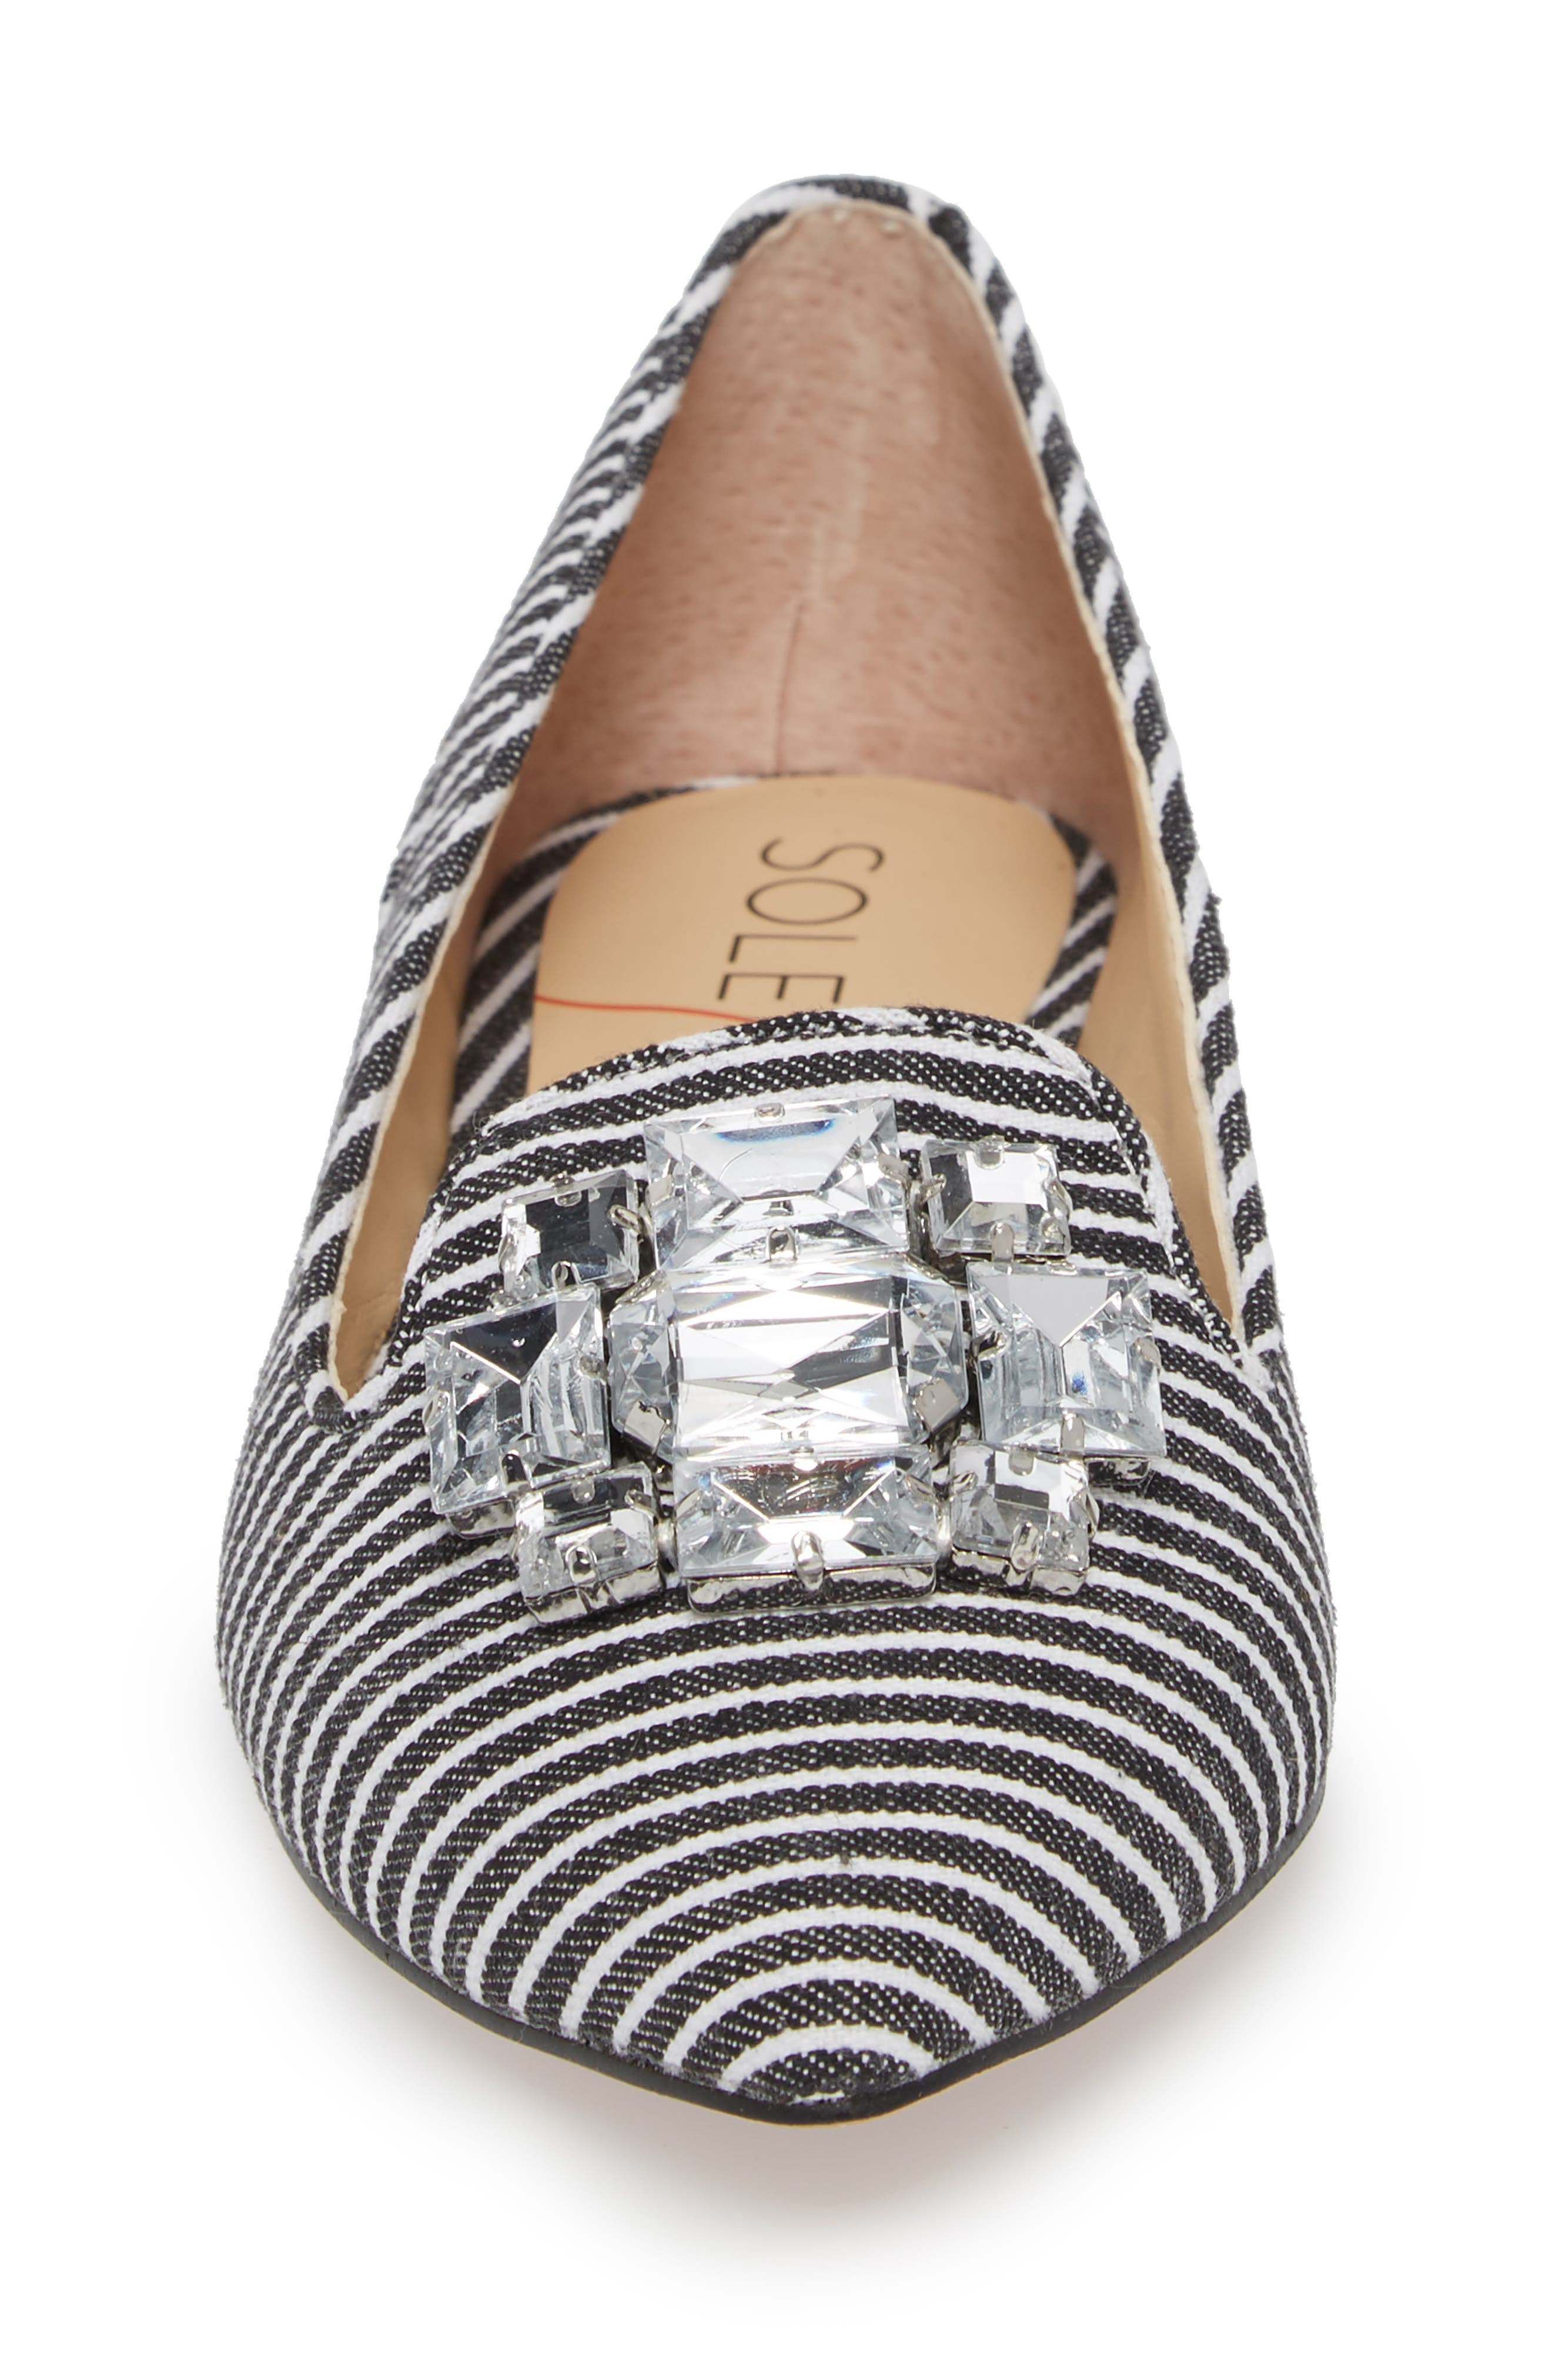 Libry Crystal Embellished Flat,                             Alternate thumbnail 4, color,                             Black/ White Fabric